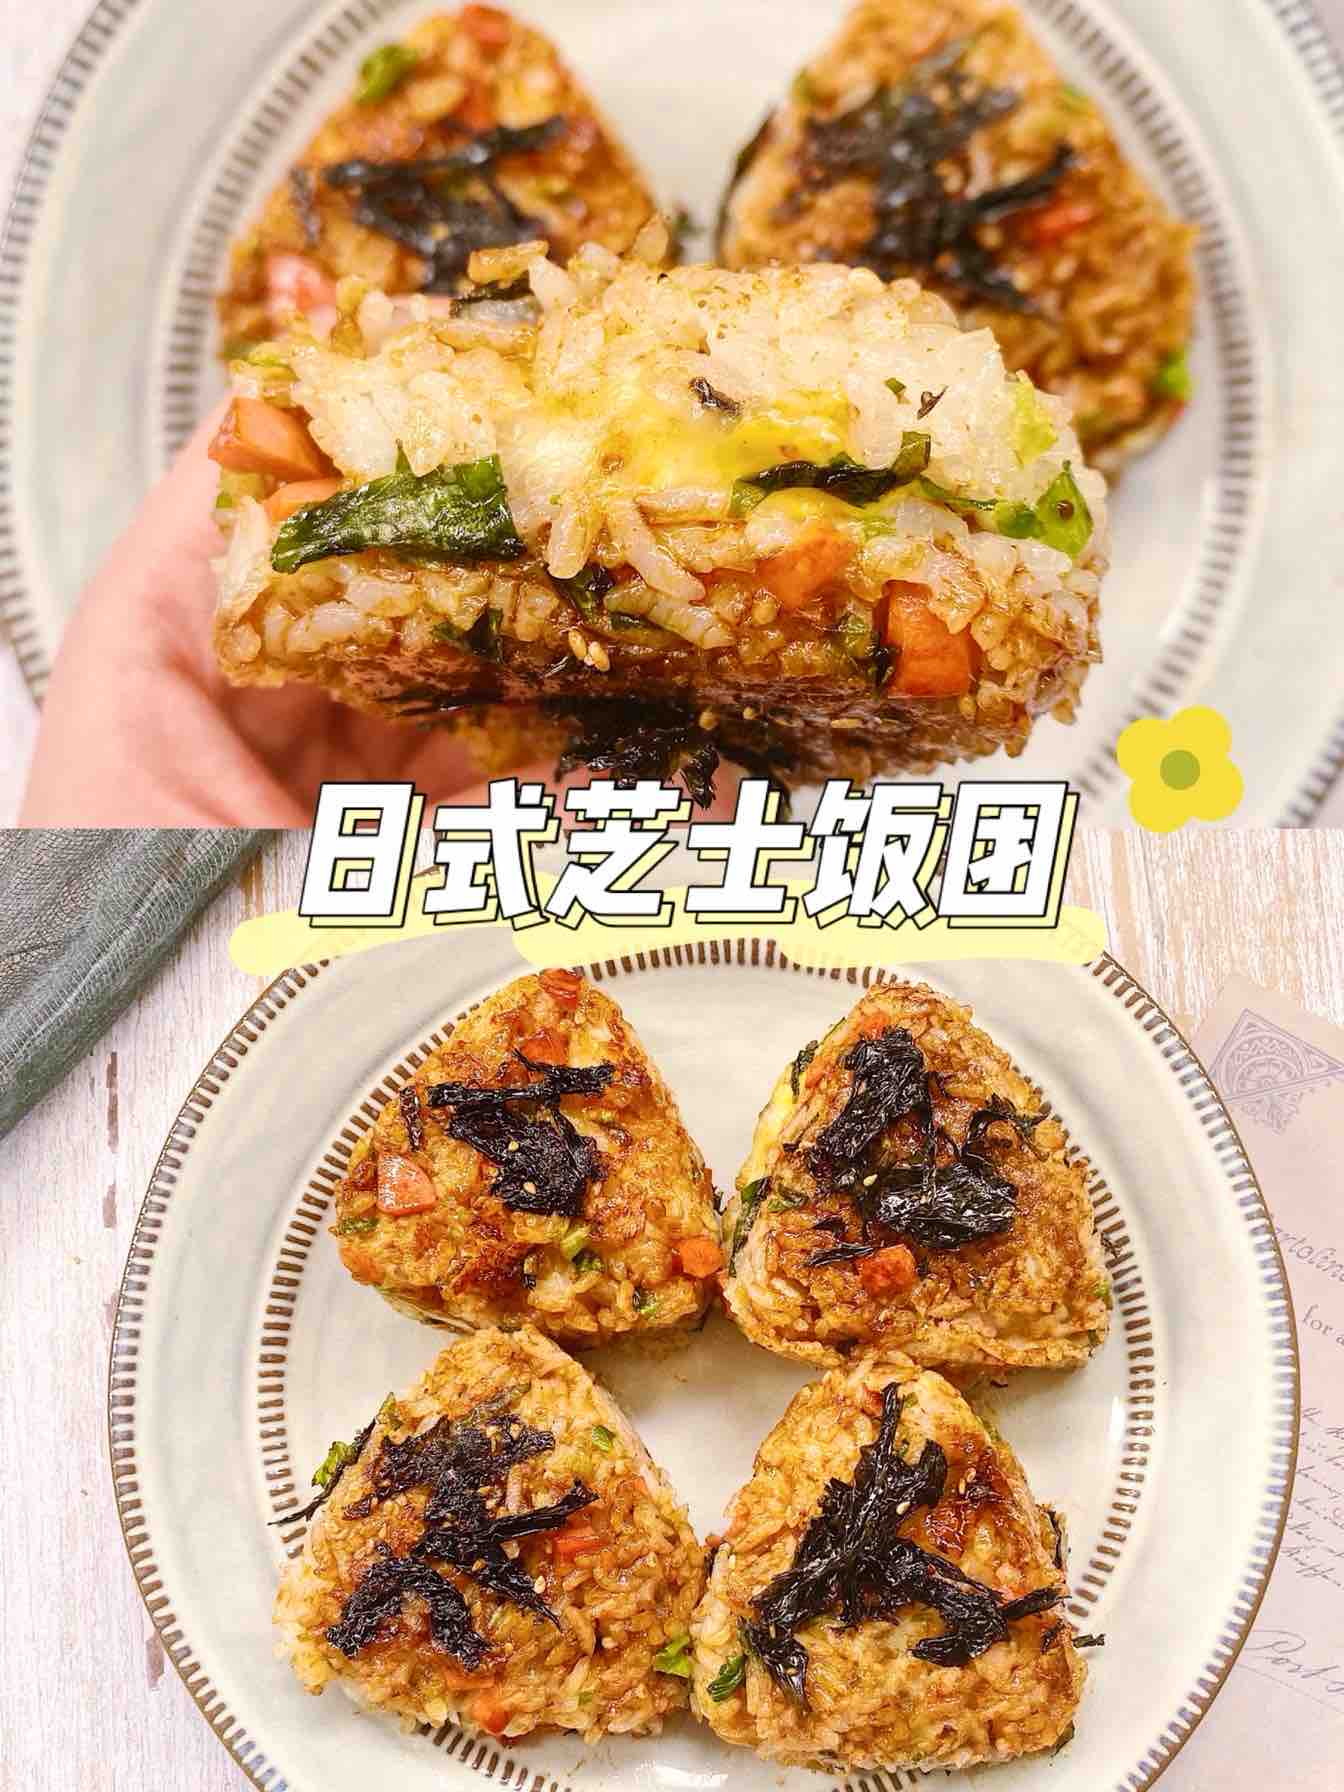 ㊙️米饭的神仙吃法|日式芝士饭团的做法